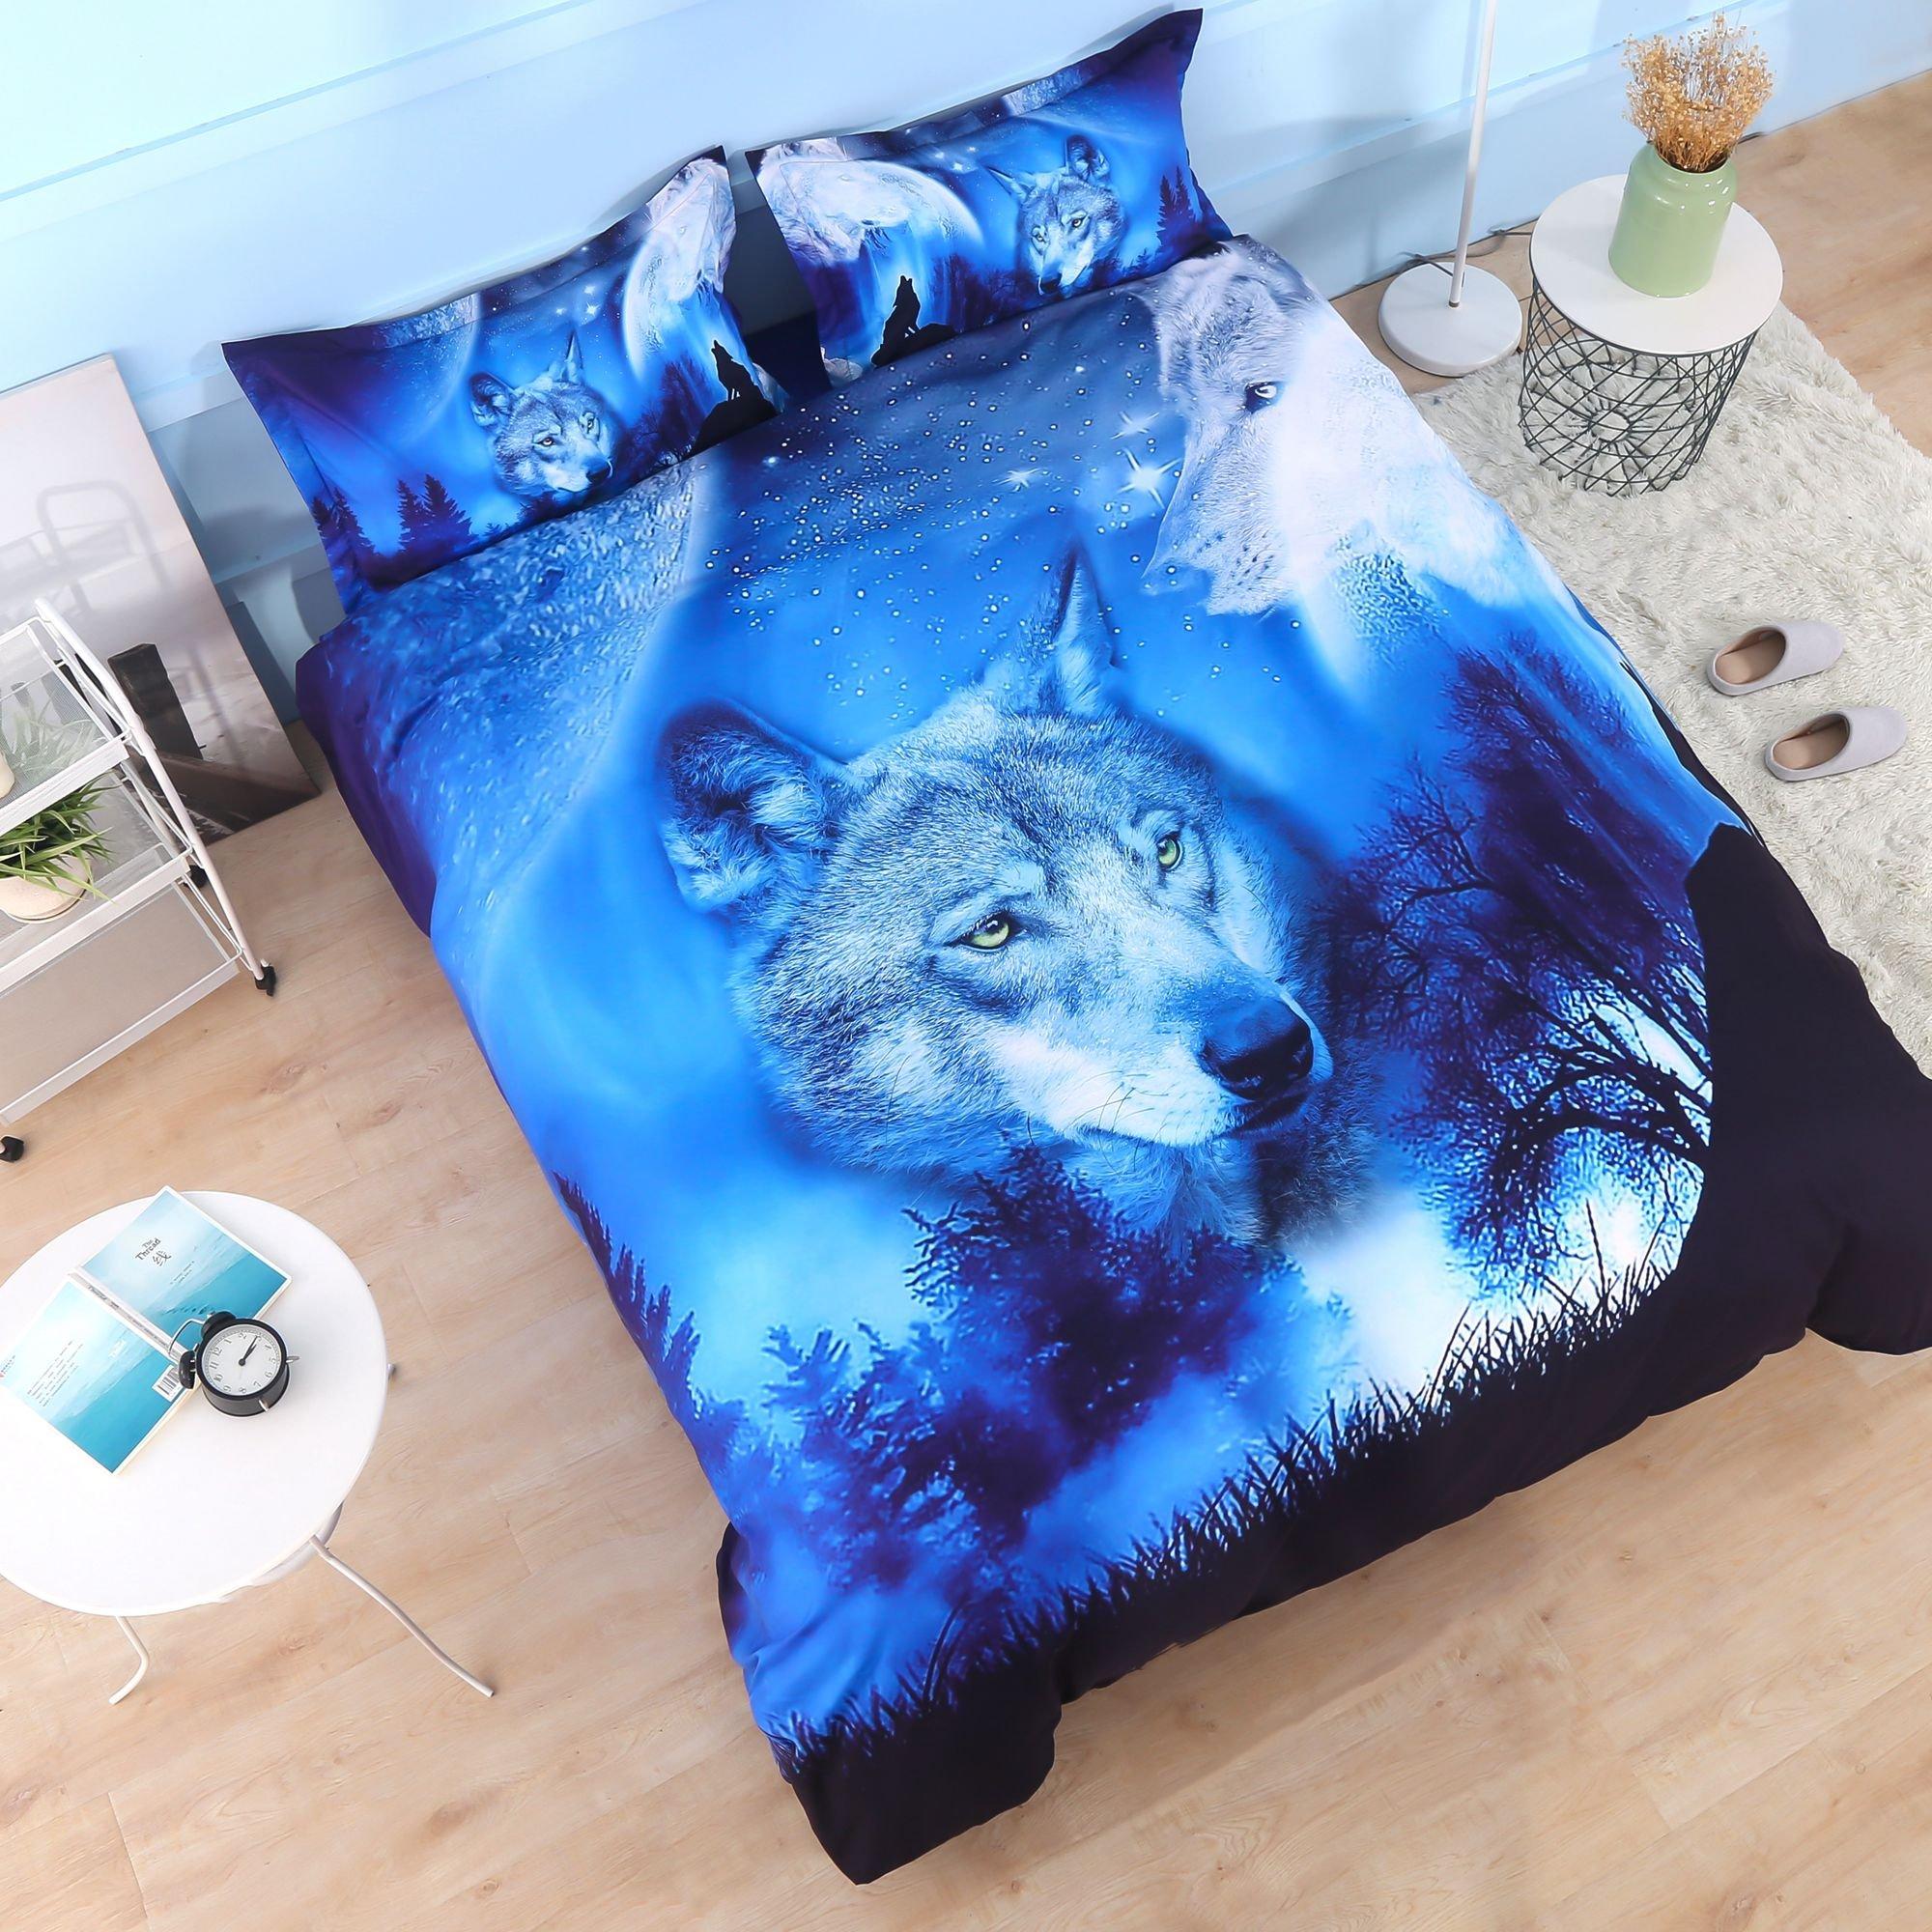 Beddinginn 4Pcs 3d Tencel Cotton Blend Blue Wolf Bedding Sets Duvet Cover Set.1 Duvet Cover+2 Pillowcase+1 Flat Sheet.No Comforter Included(King Size 102''x90'')